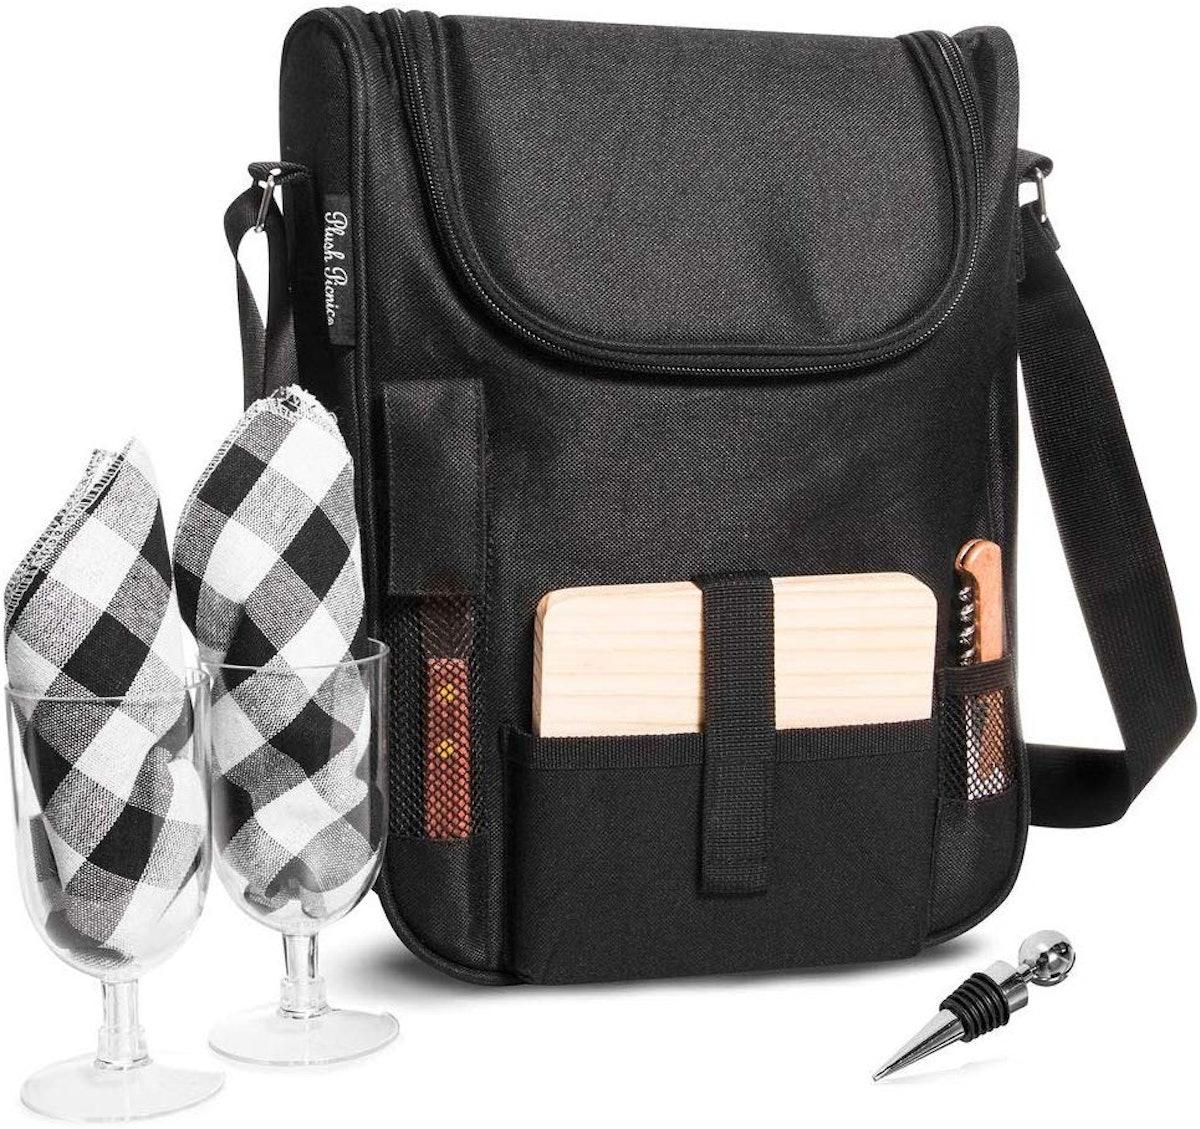 Plush Picnic Insulated Travel Wine Tote Bag